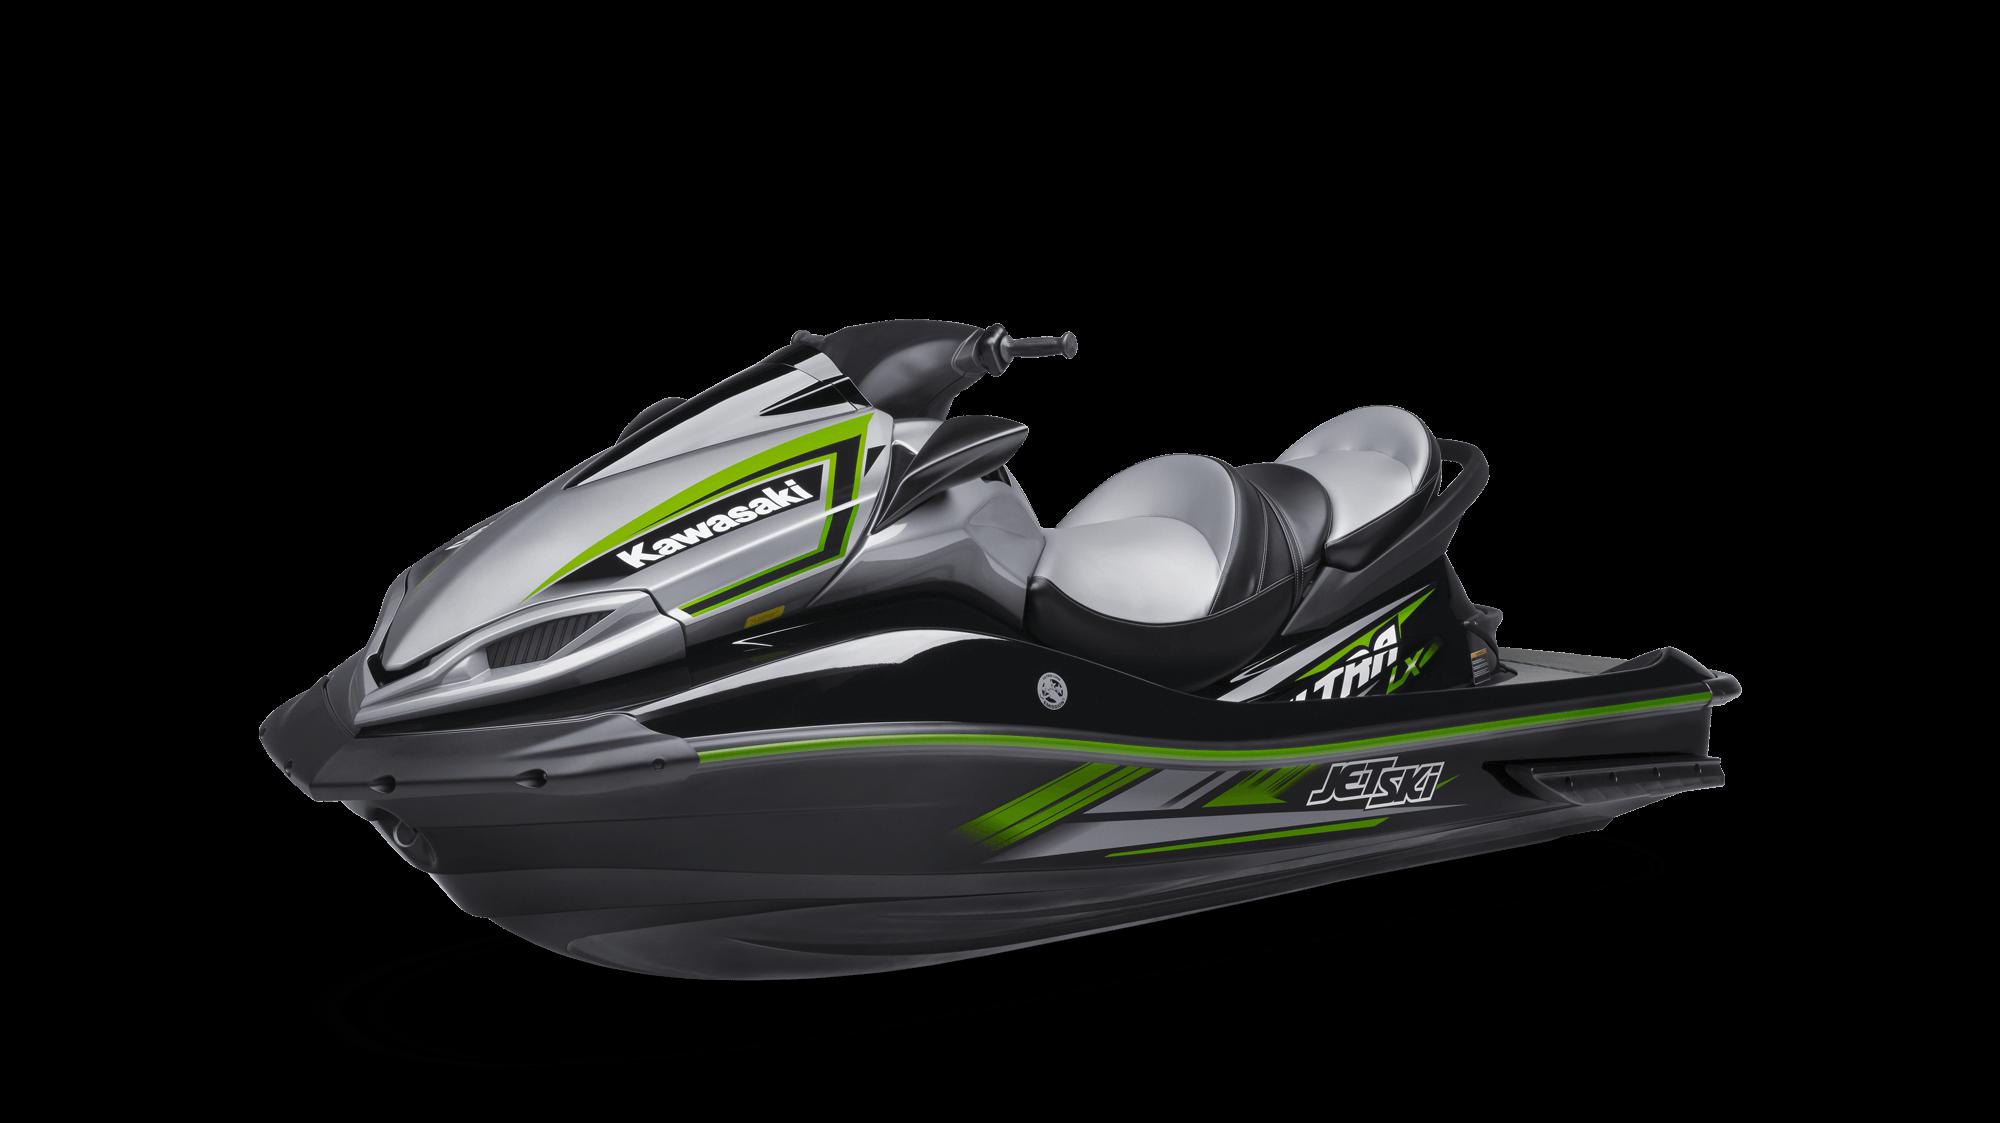 Check Out The Kawasaki 2016 Jet Ski Ultra Lx Jet Ski Skis For Sale Seadoo Jetski